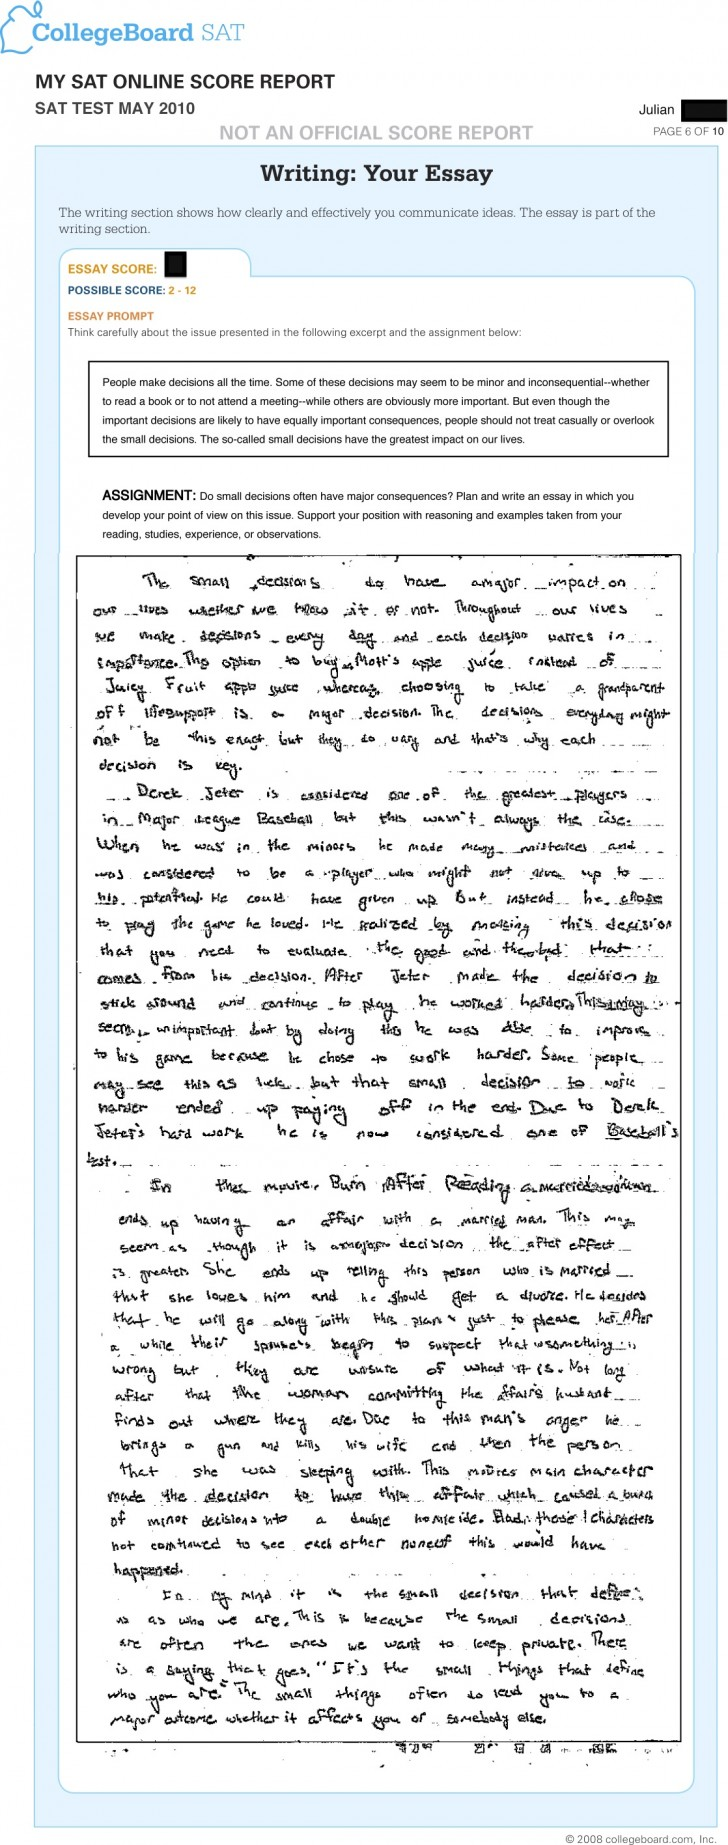 011 Essay Example Sat Prompts Jr May Surprising 2015 2017 Prompt June 728